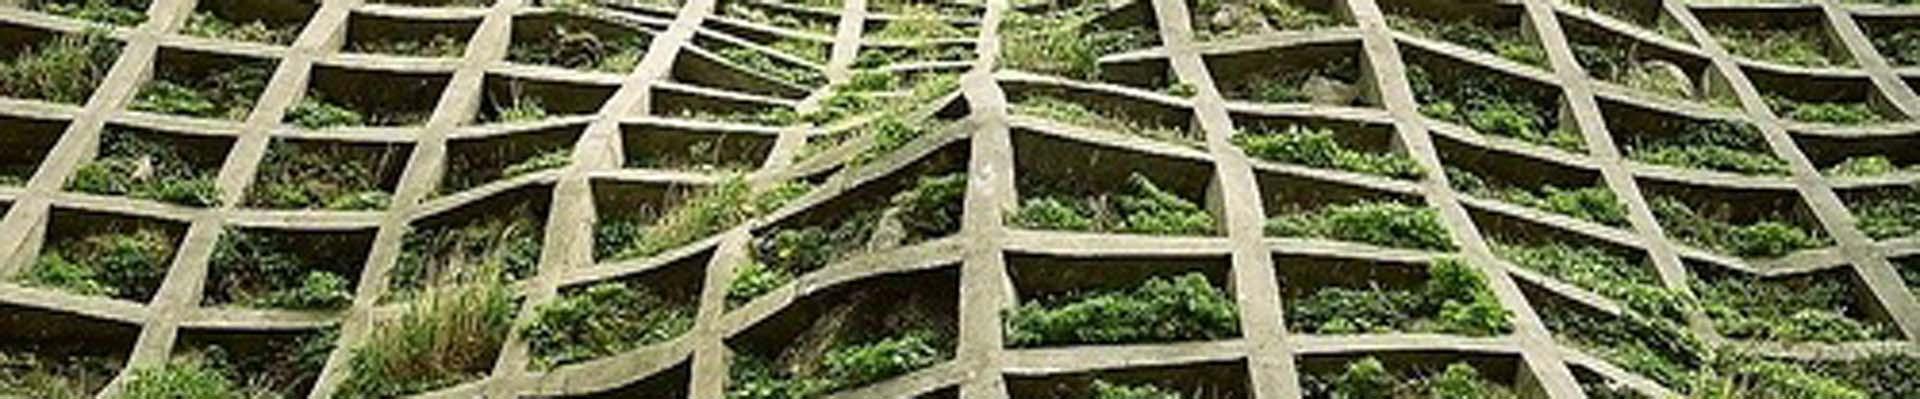 OrganicARCHITECT San Francisco Green Architecture